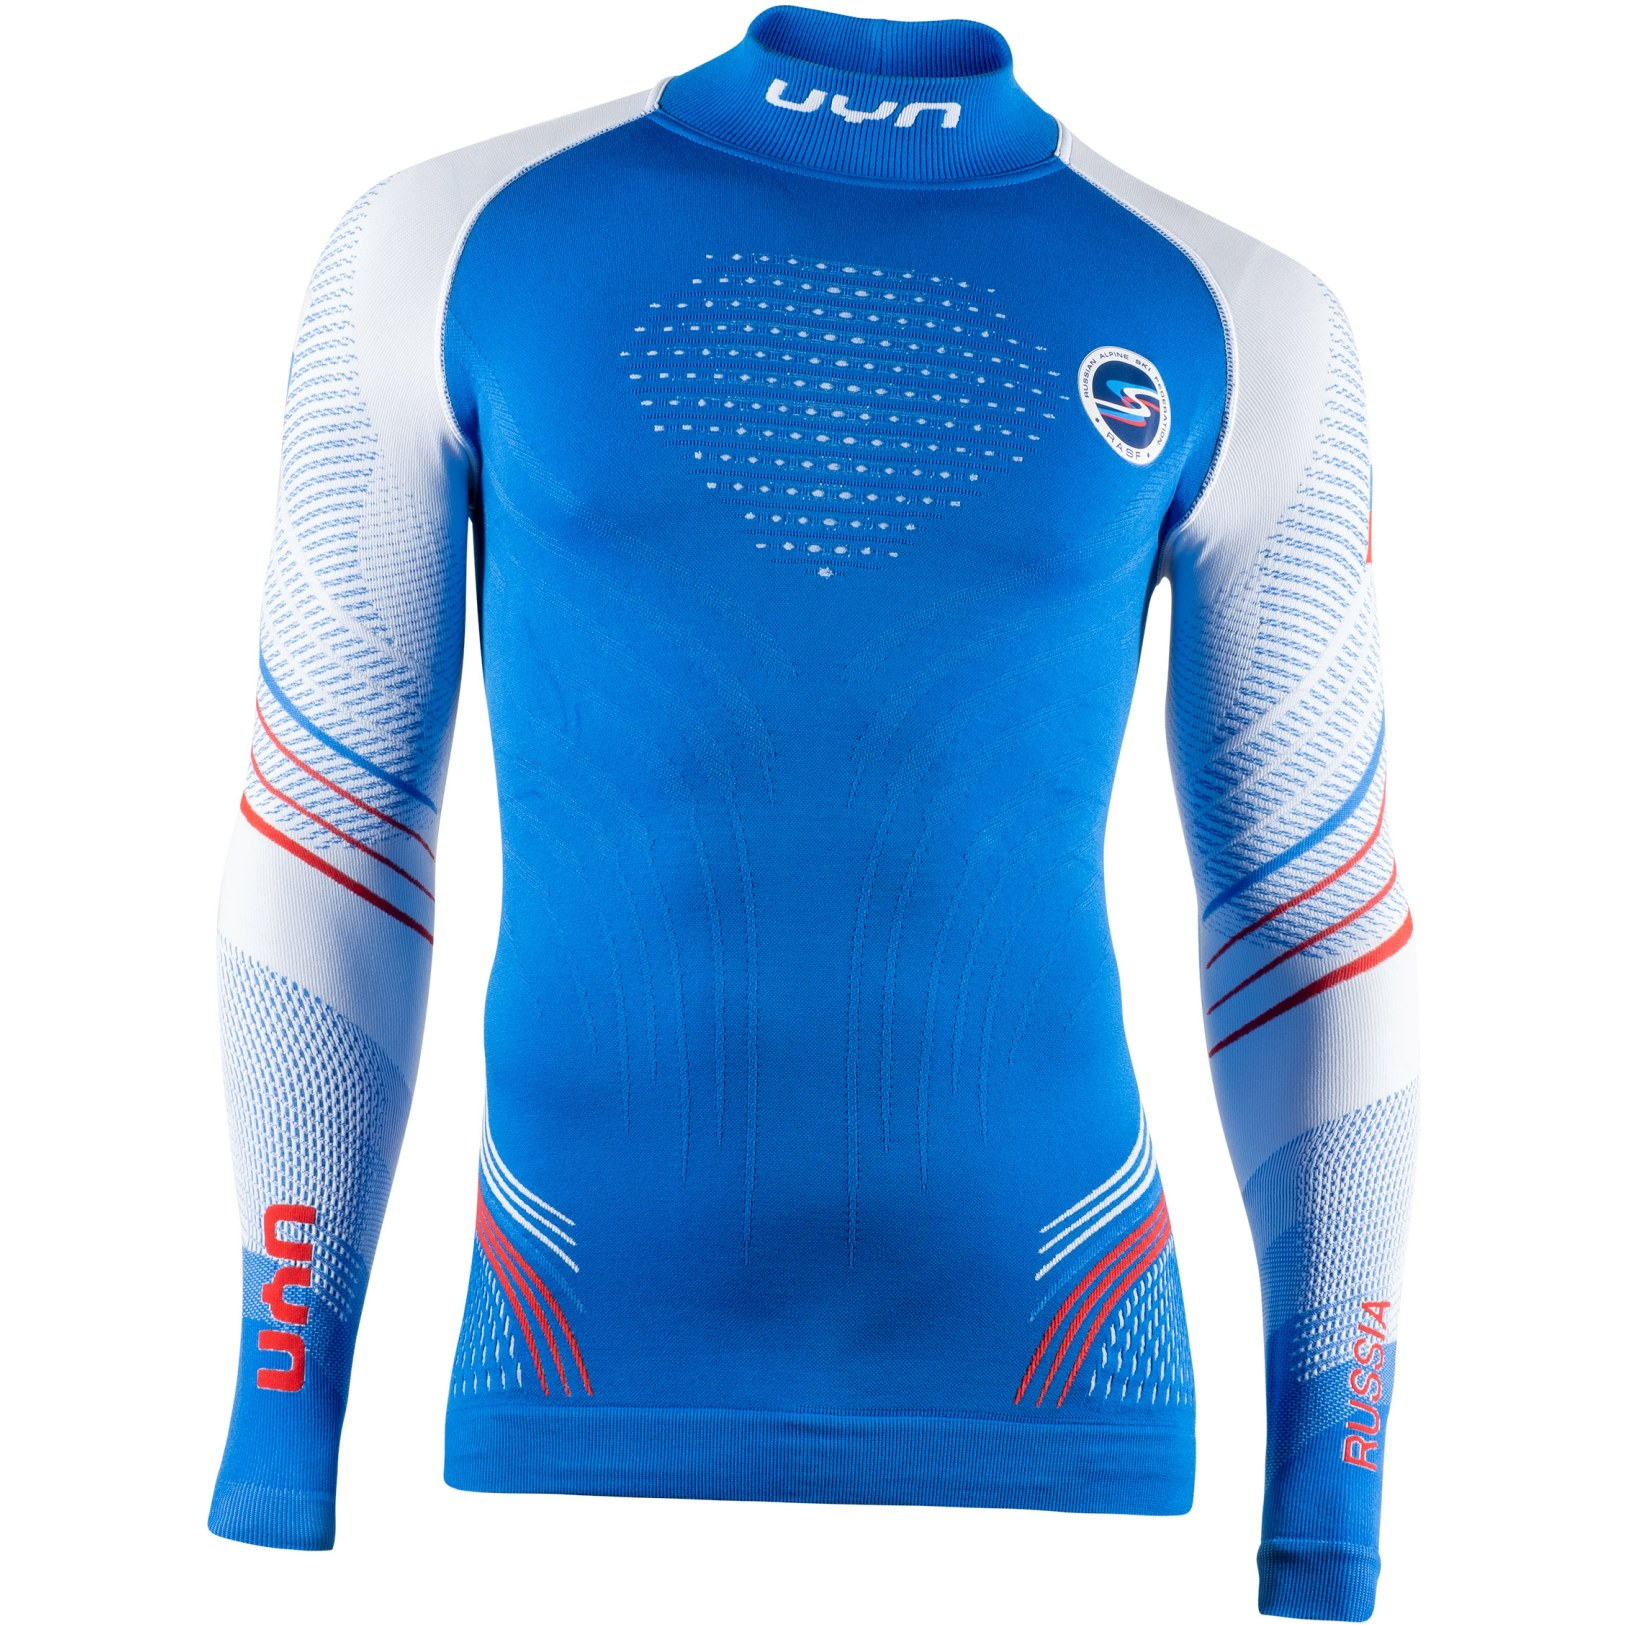 UYN Natyon 2.0 Russia Long Sleeve Turtle Neck Underwear Shirt - Russia